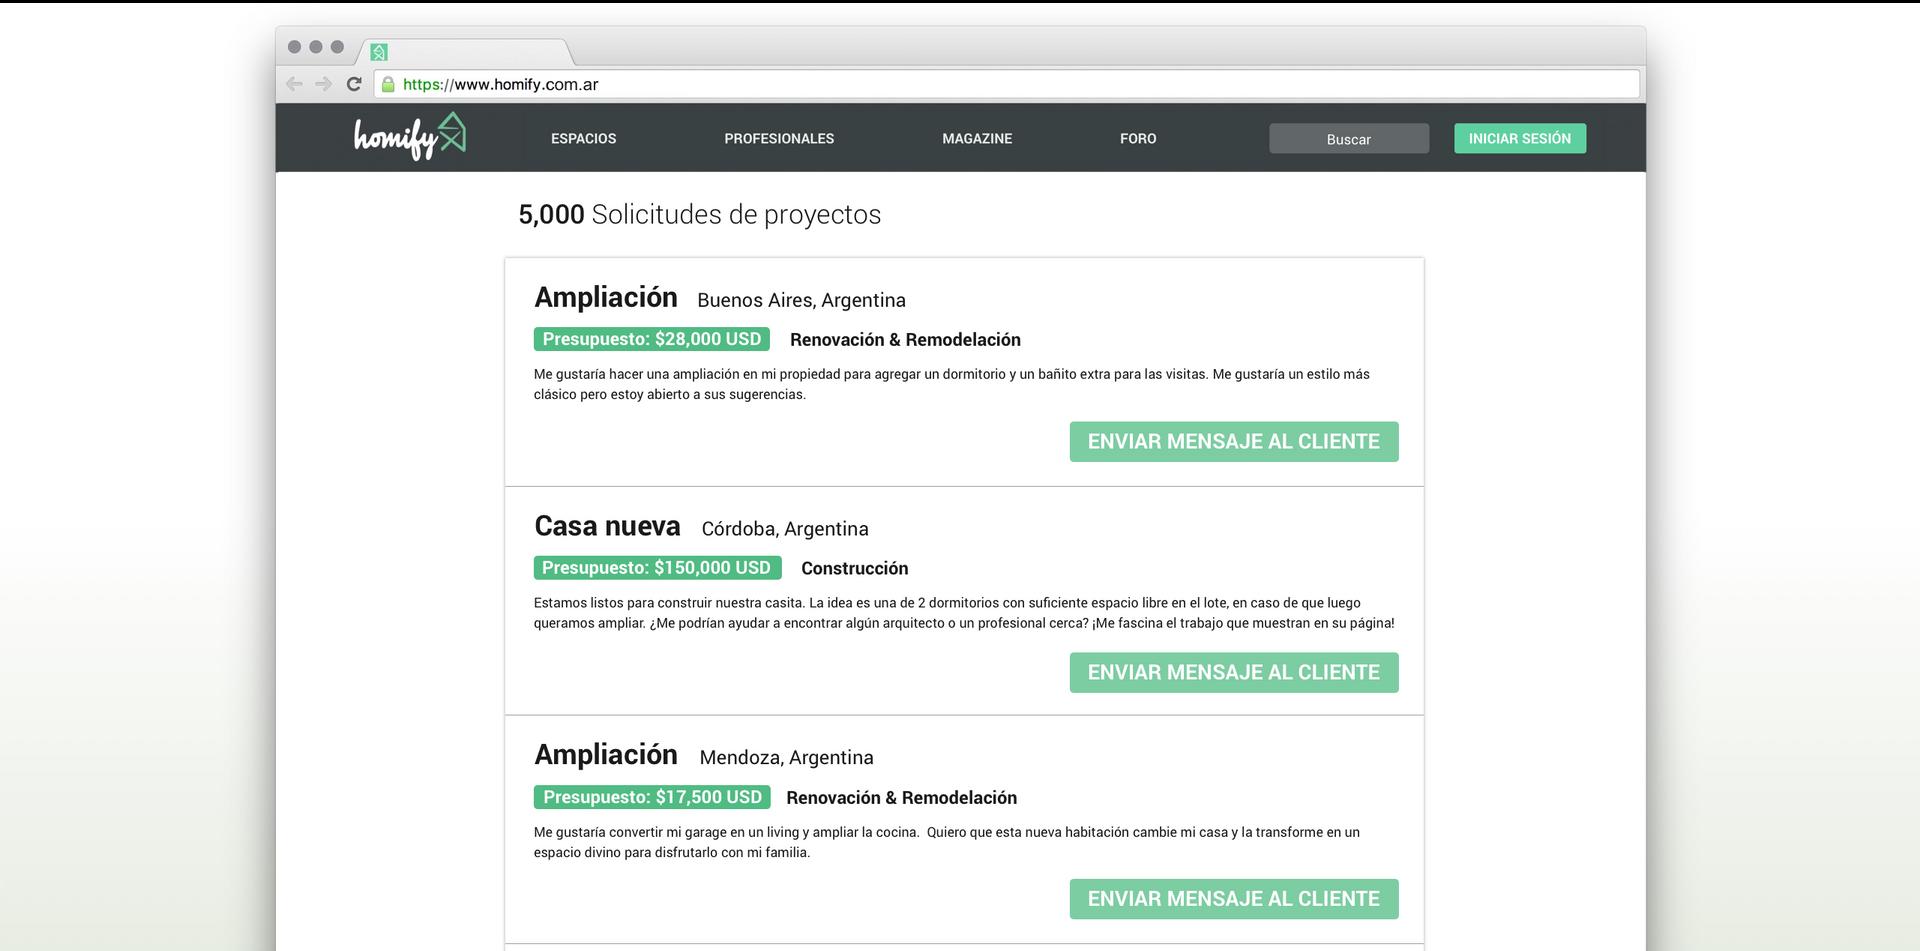 Acceso ilimitado a solicitudes de proyectos